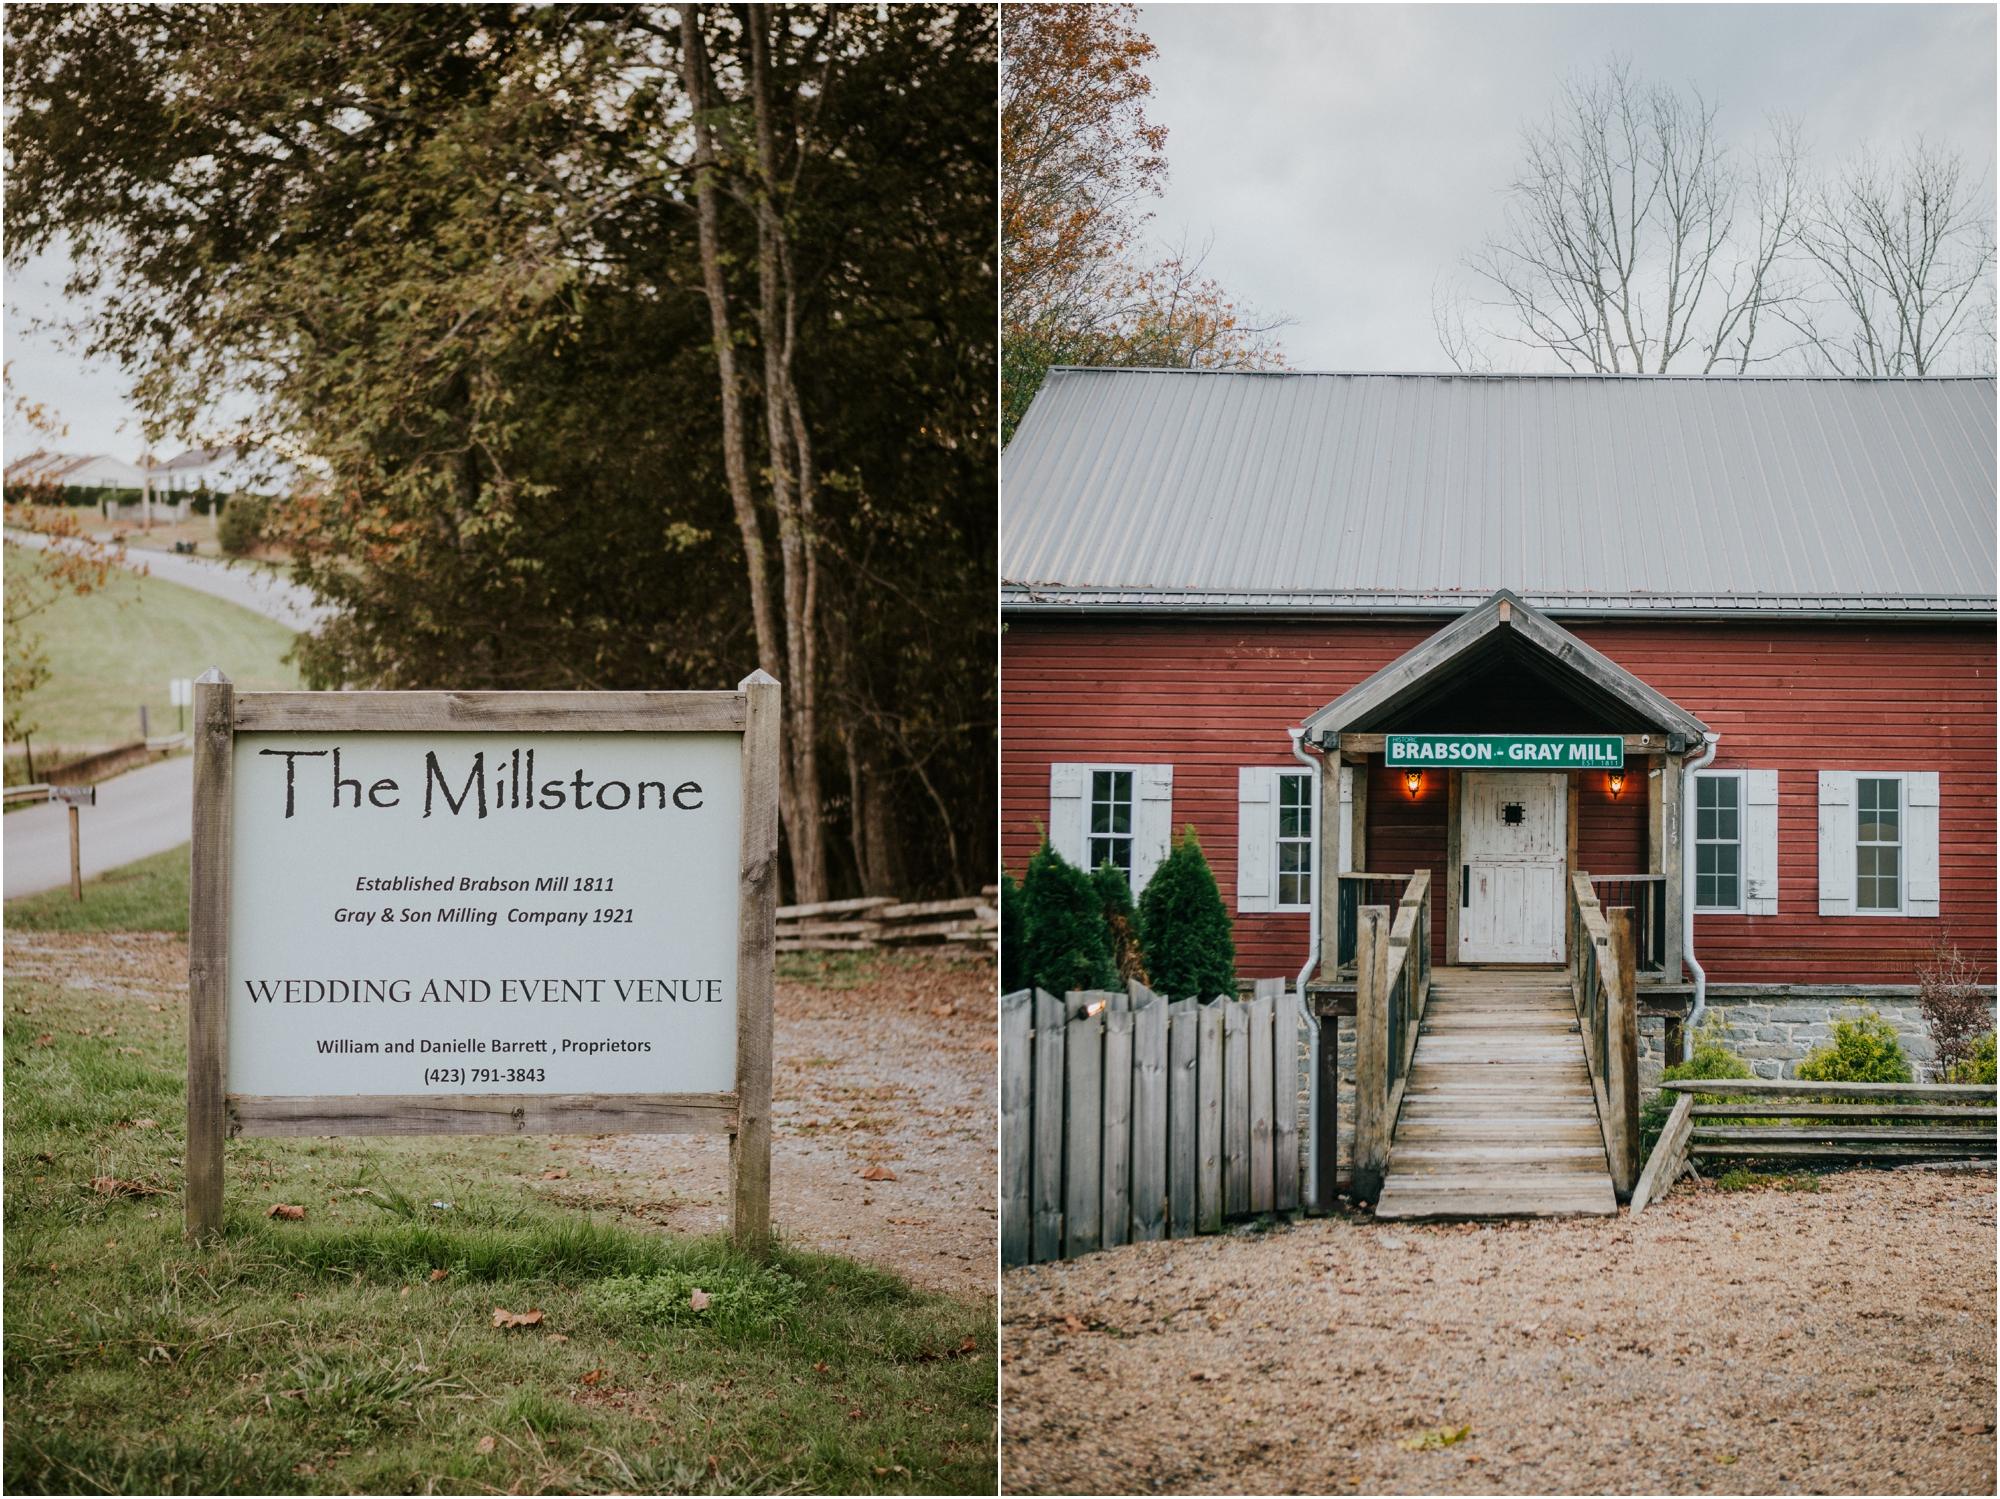 katy-sergent-millstone-limestone-tn-rustic-fall-engagement-session-adventurous-outdoors-intimate-elopement-wedding-northeast-johnson-city-photographer_0003.jpg